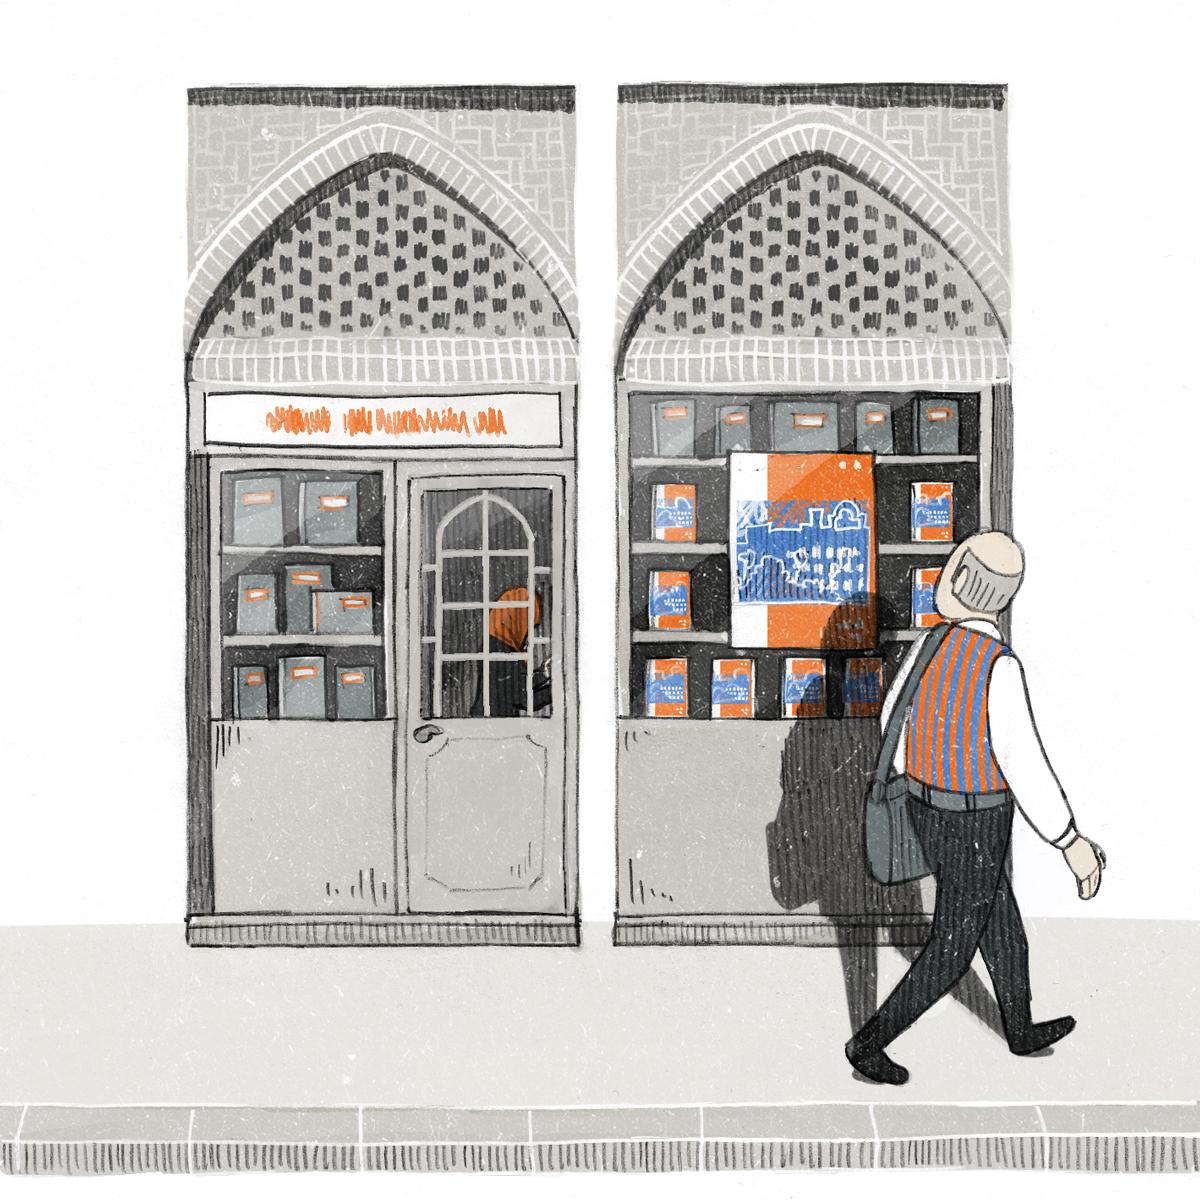 "Illustration for Campus NZZ 11/11/13 ""Bestsellerautor"" by Danae Diaz"